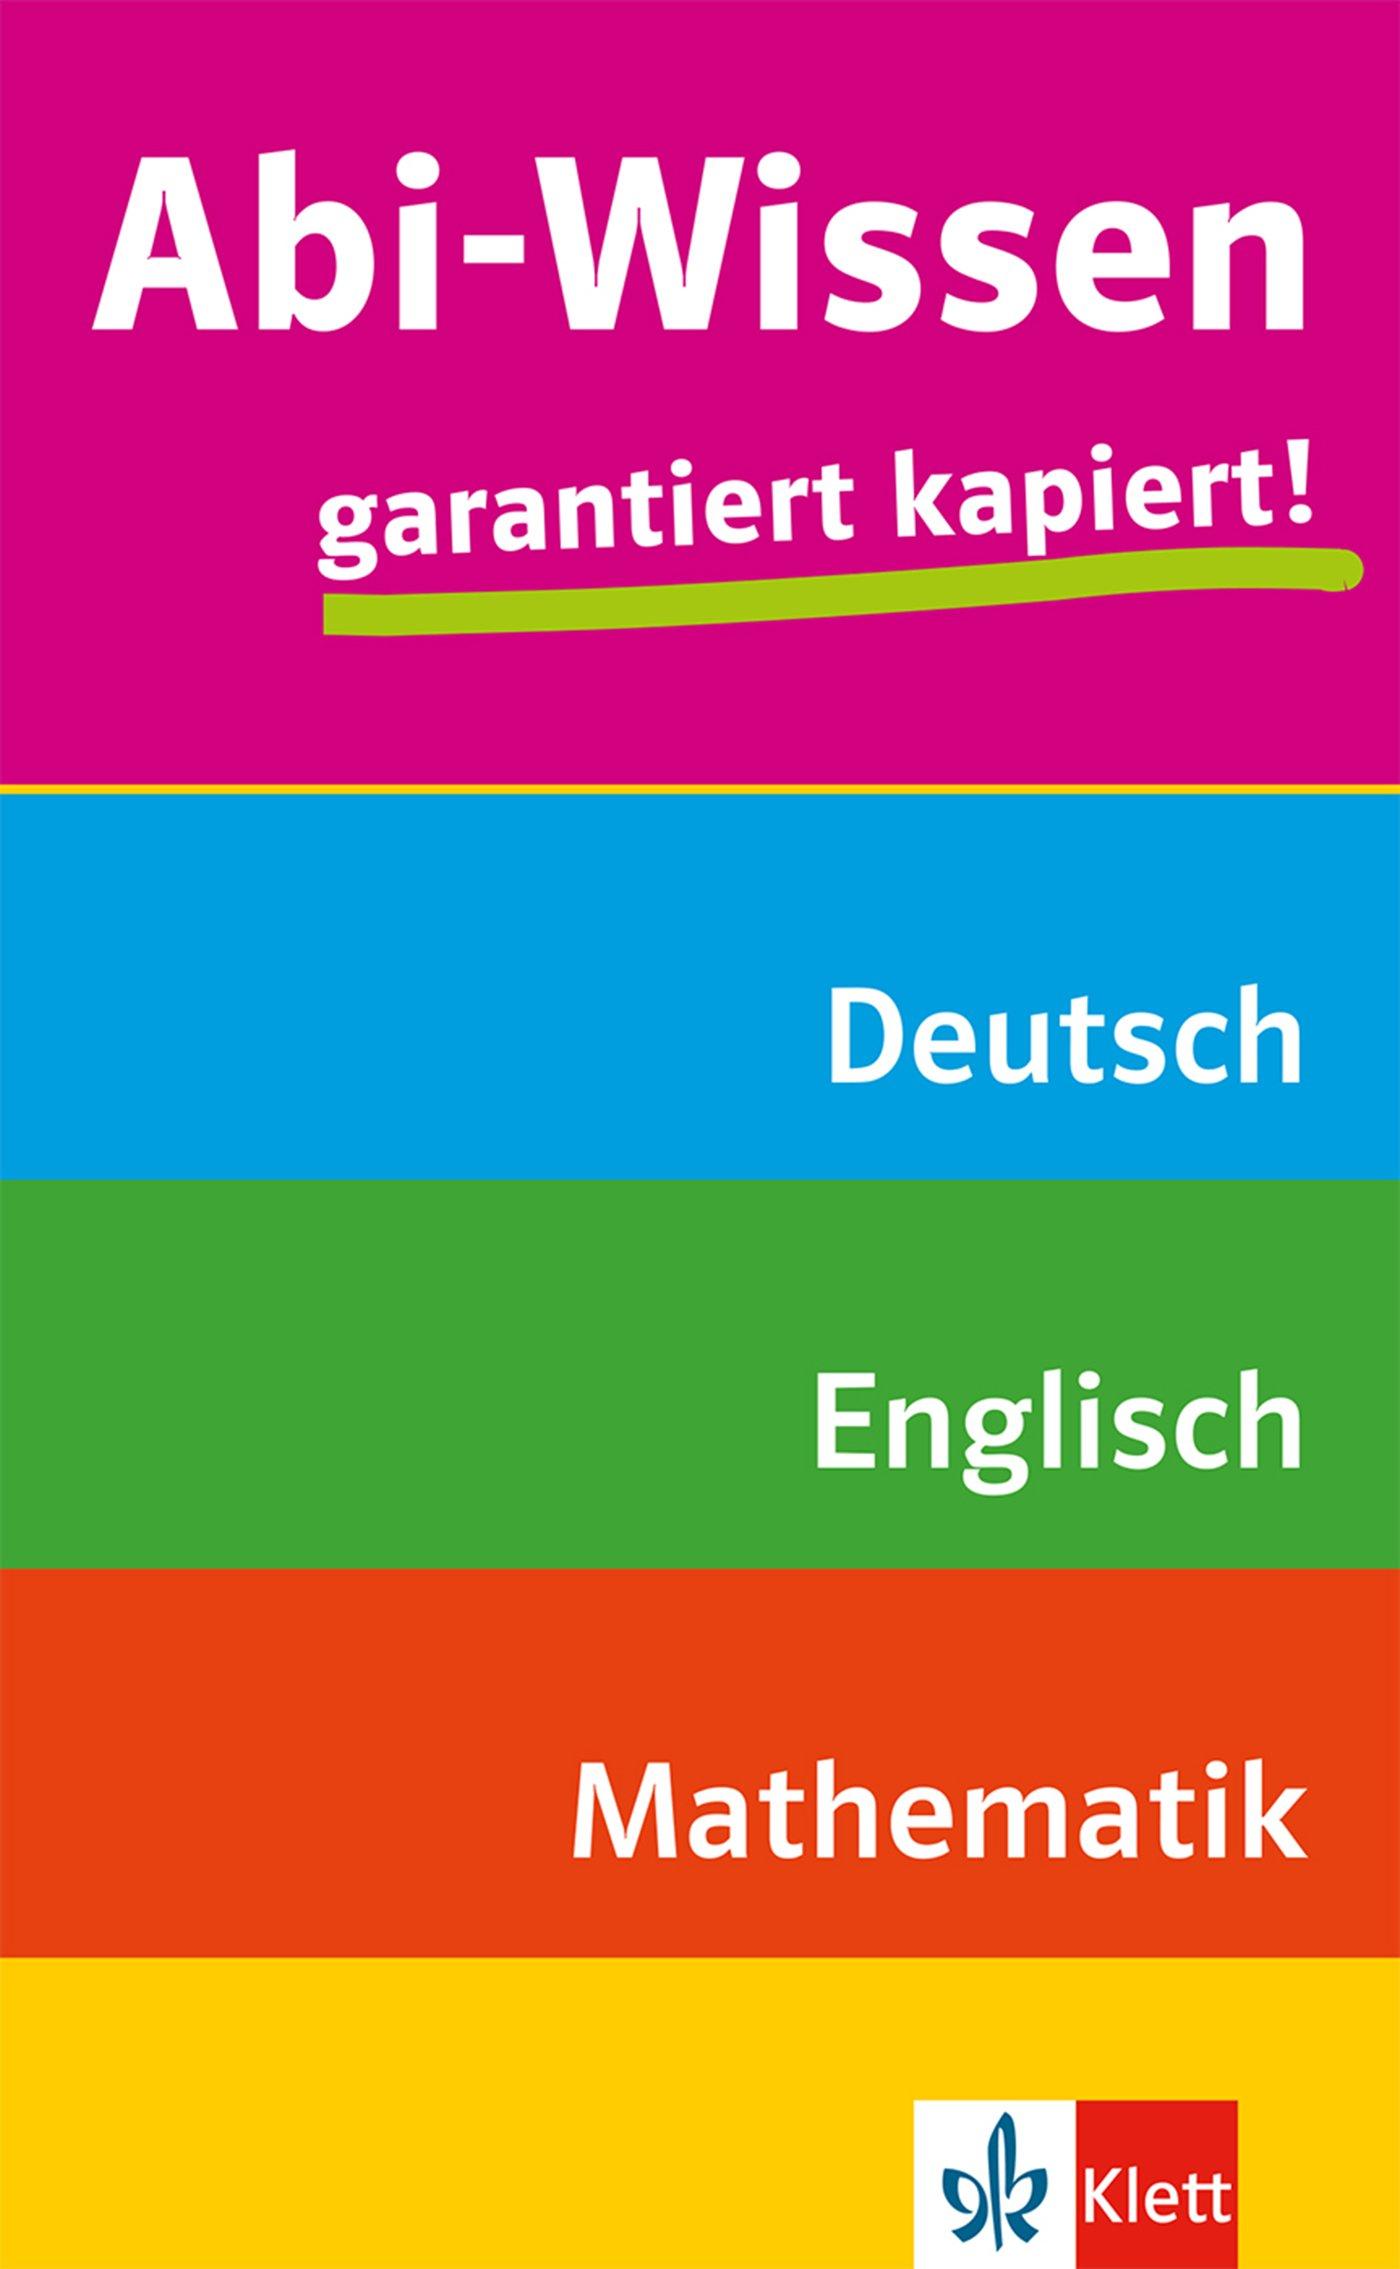 klett-abi-wissen-mathematik-deutsch-englisch-garantiert-kapiert